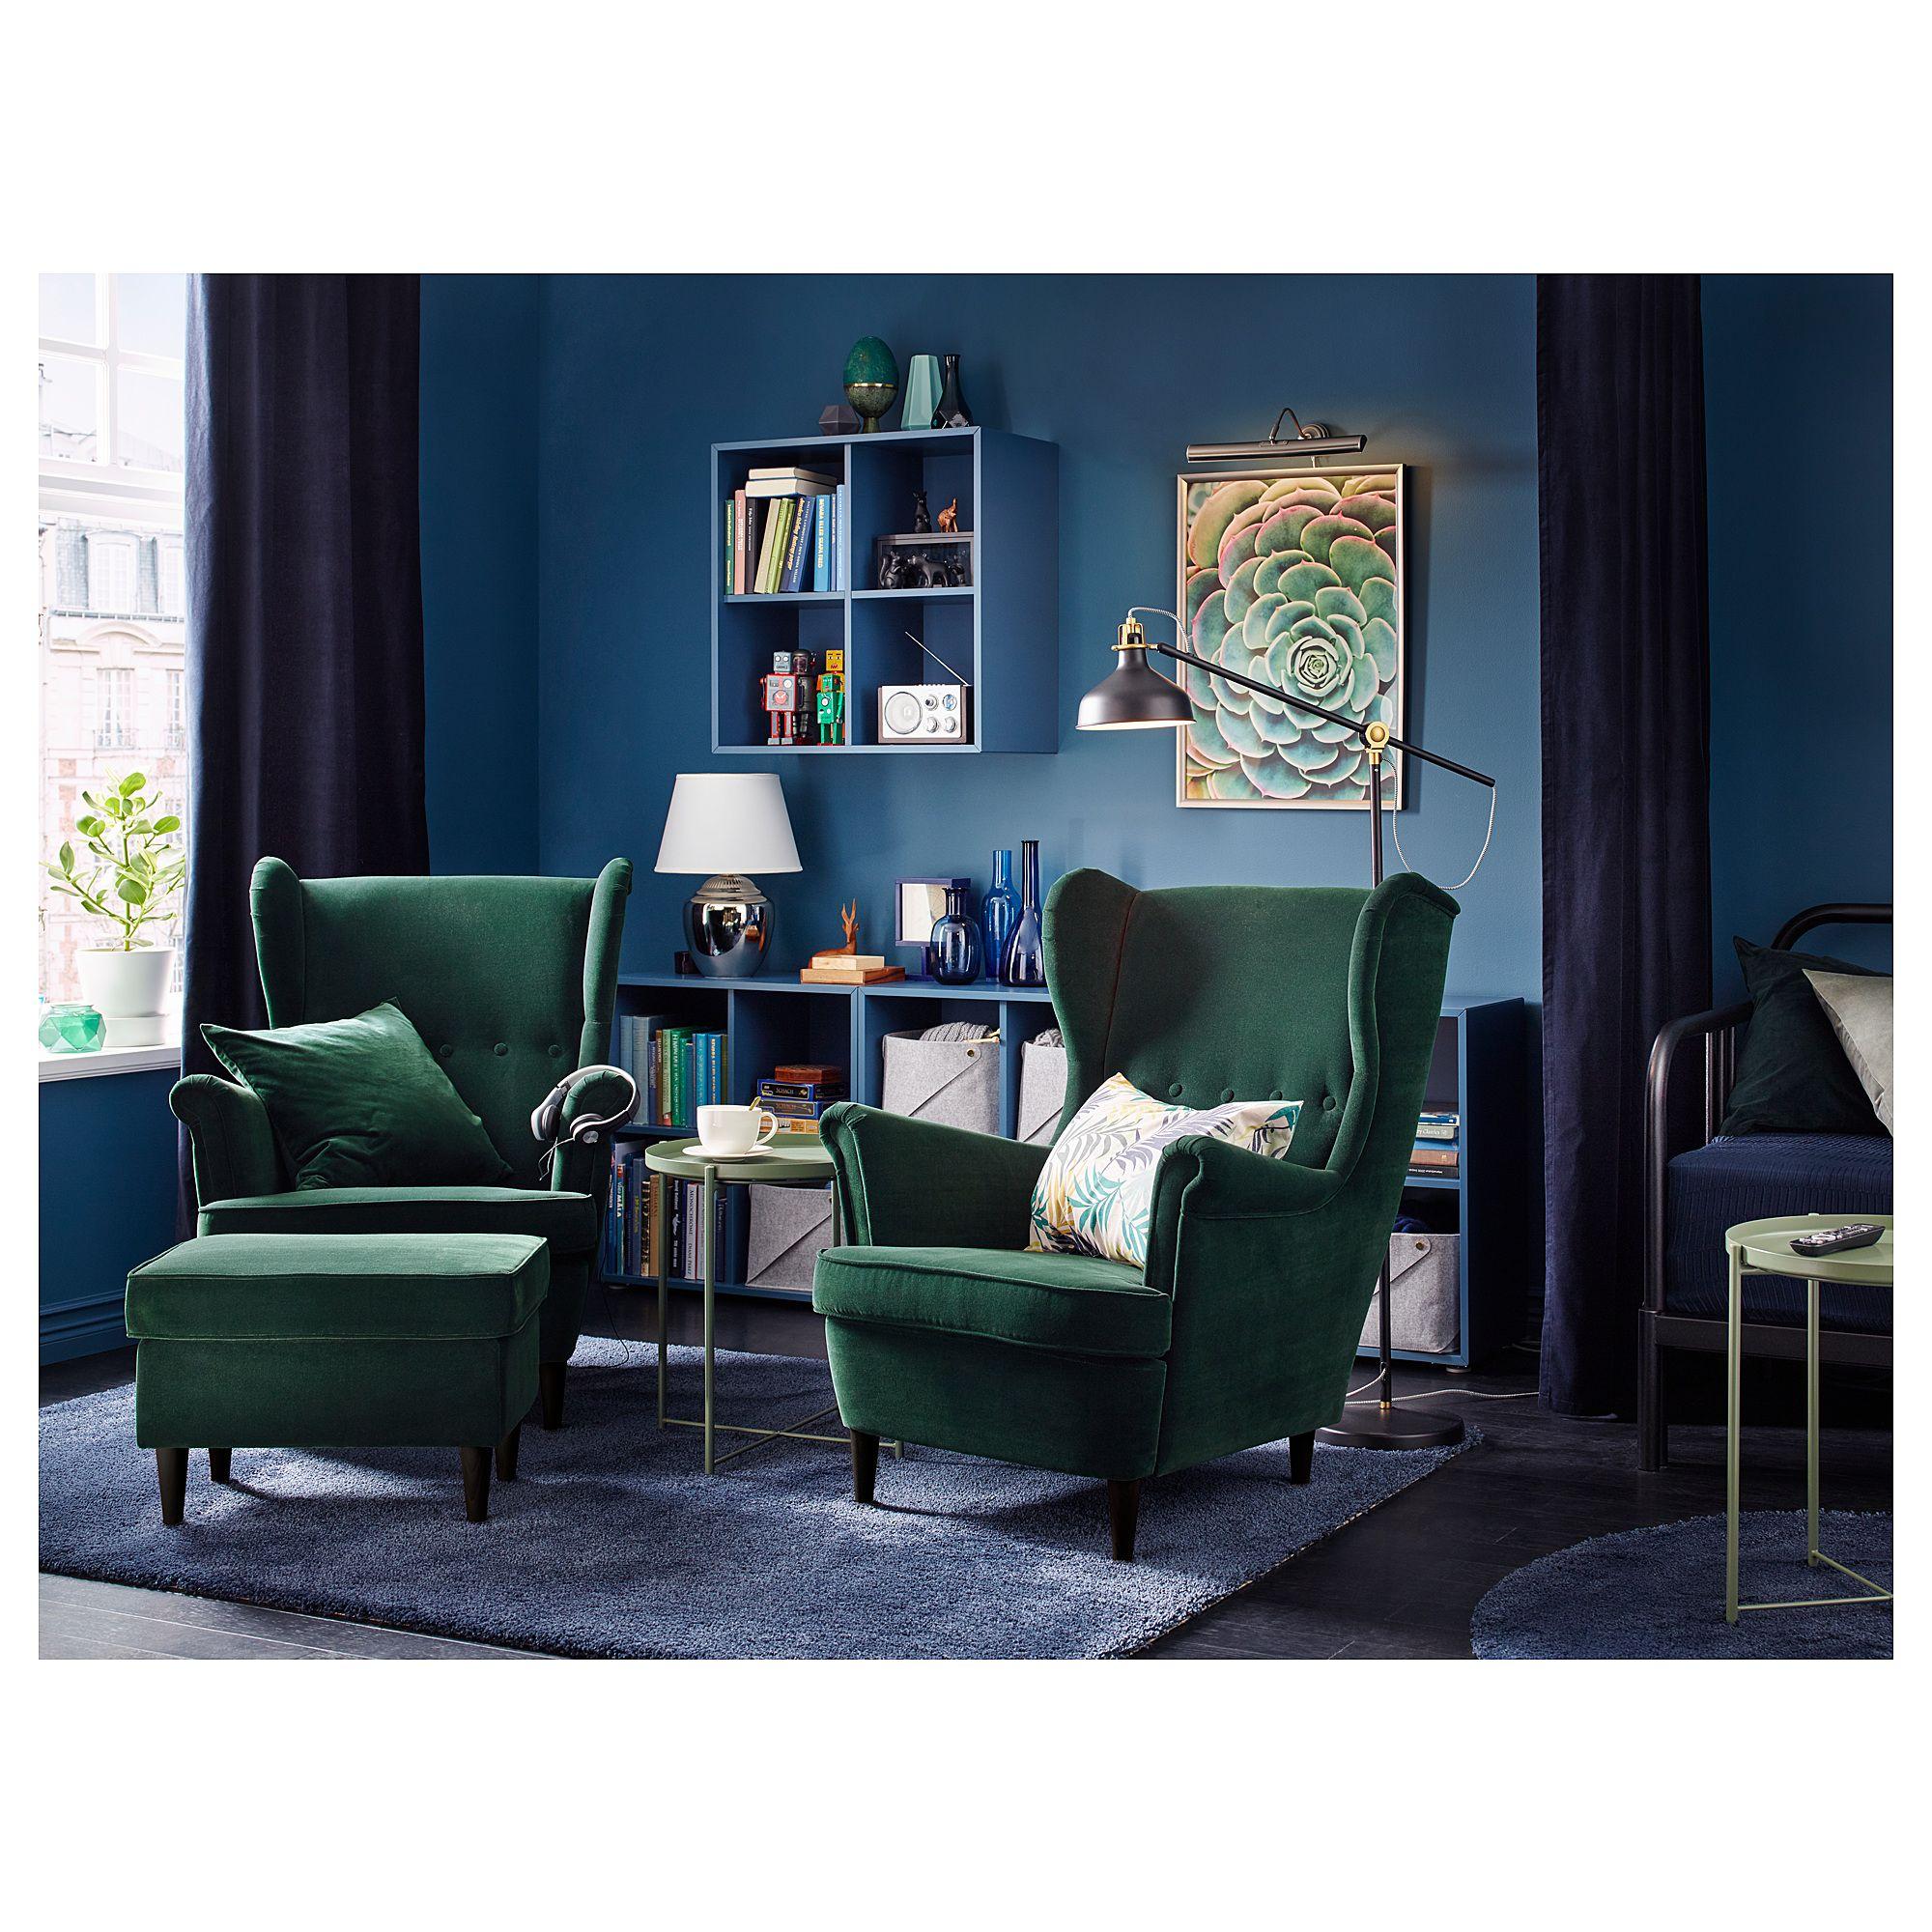 Living Room Ikea Indonesia: STRANDMON Wing Chair, Djuparp Dark Green